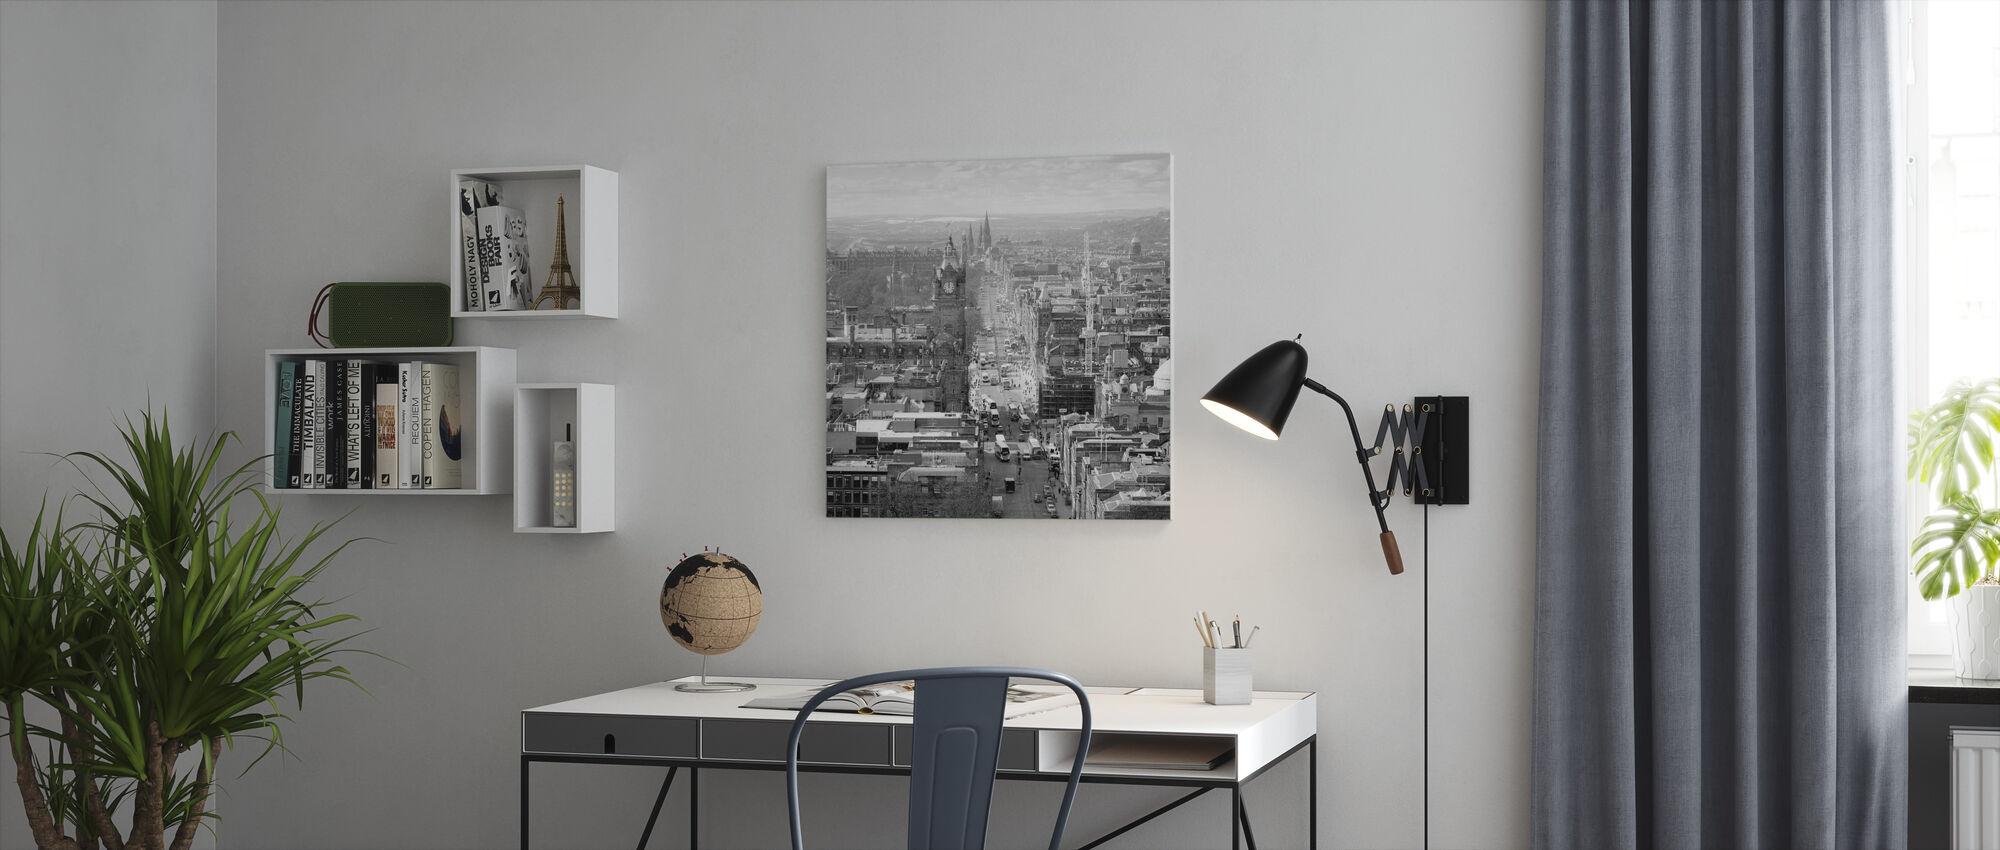 Edinburgh's Princes Street Taken at Midday - Canvas print - Office